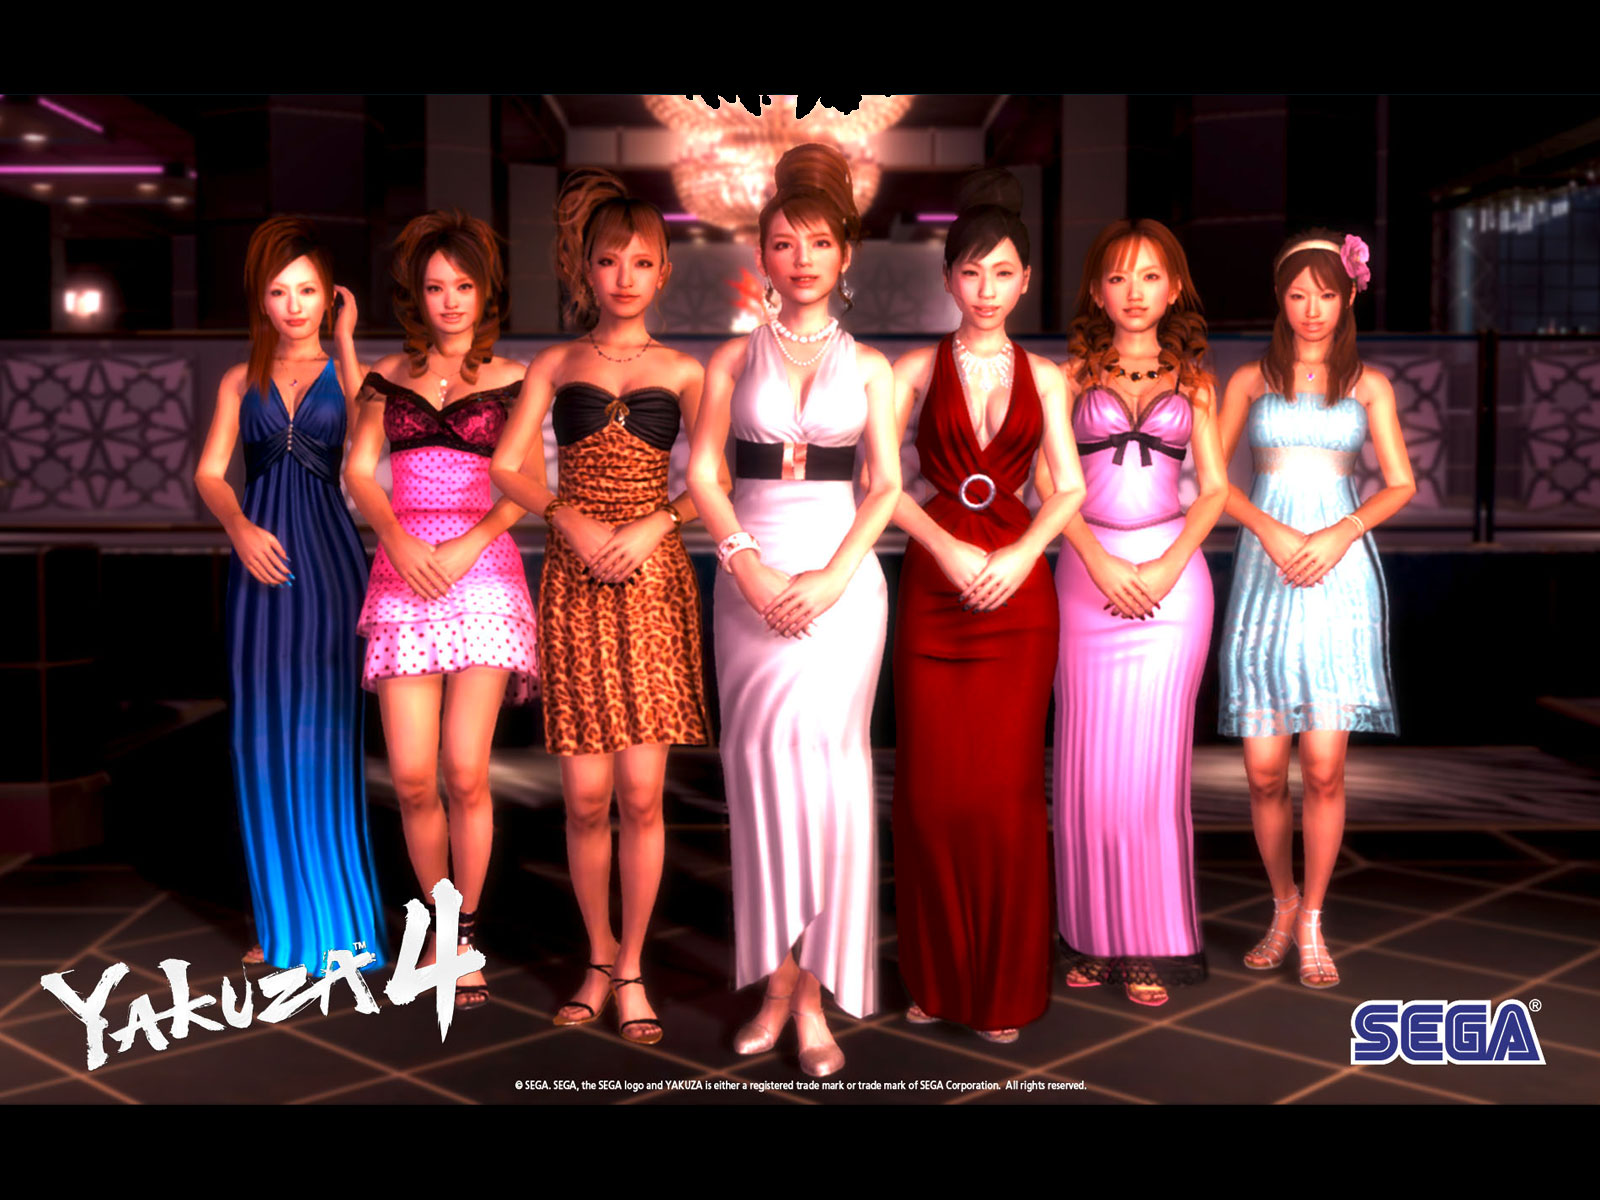 Yakuza 4 Hostess Dating-Guide erena